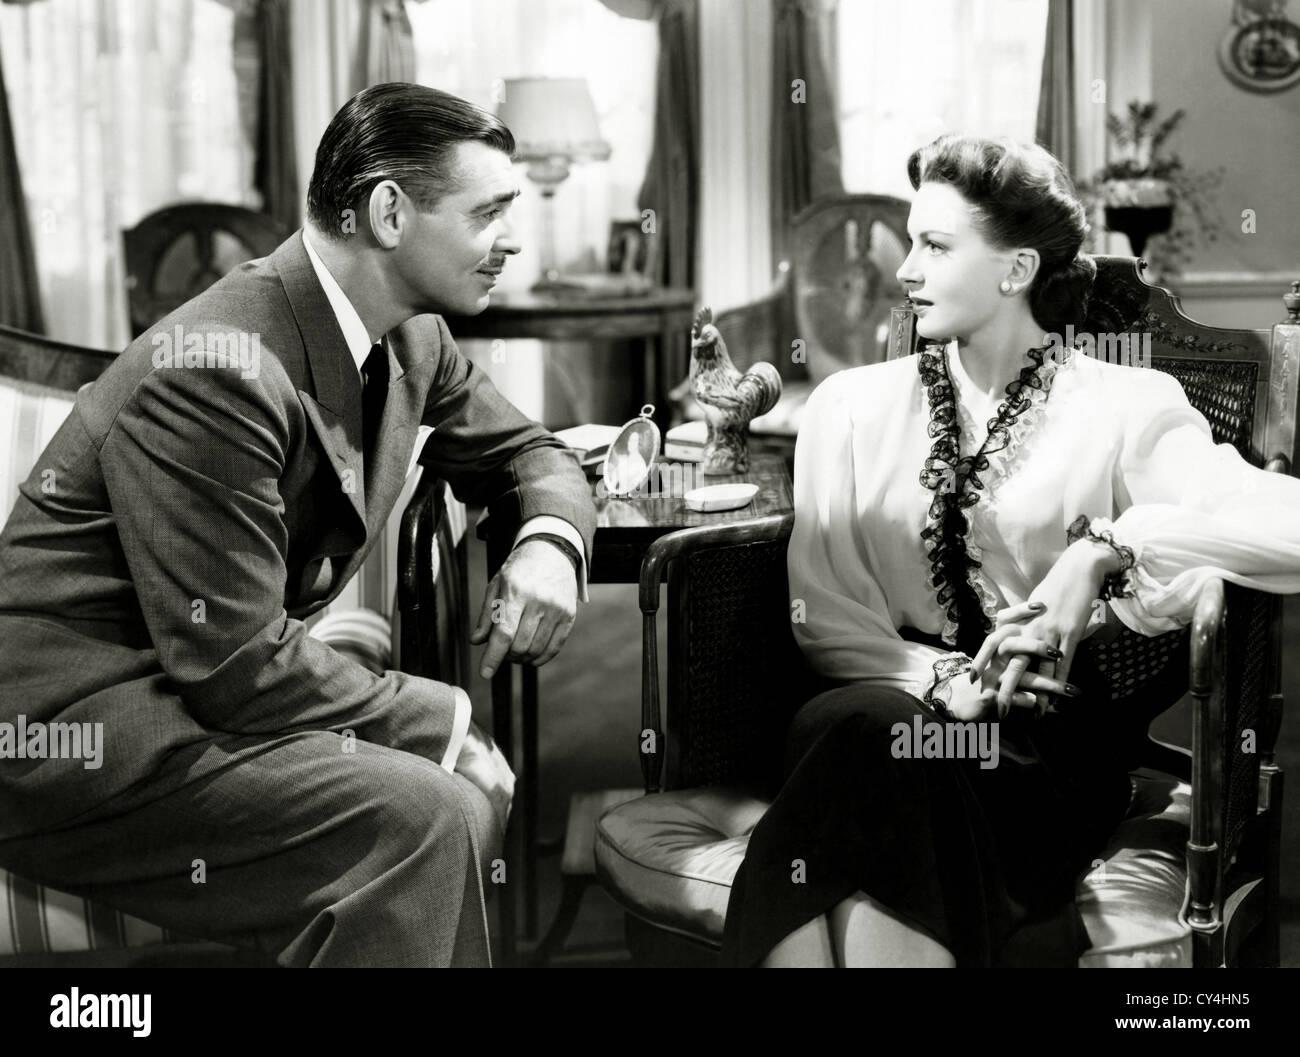 THE HUCKSTERS (1947) CLARK GABLE; DEBORAH KERR; JACK CONWAY (DIR) HUKS 002 MOVIESTORE COLLECTION LTD - Stock Image